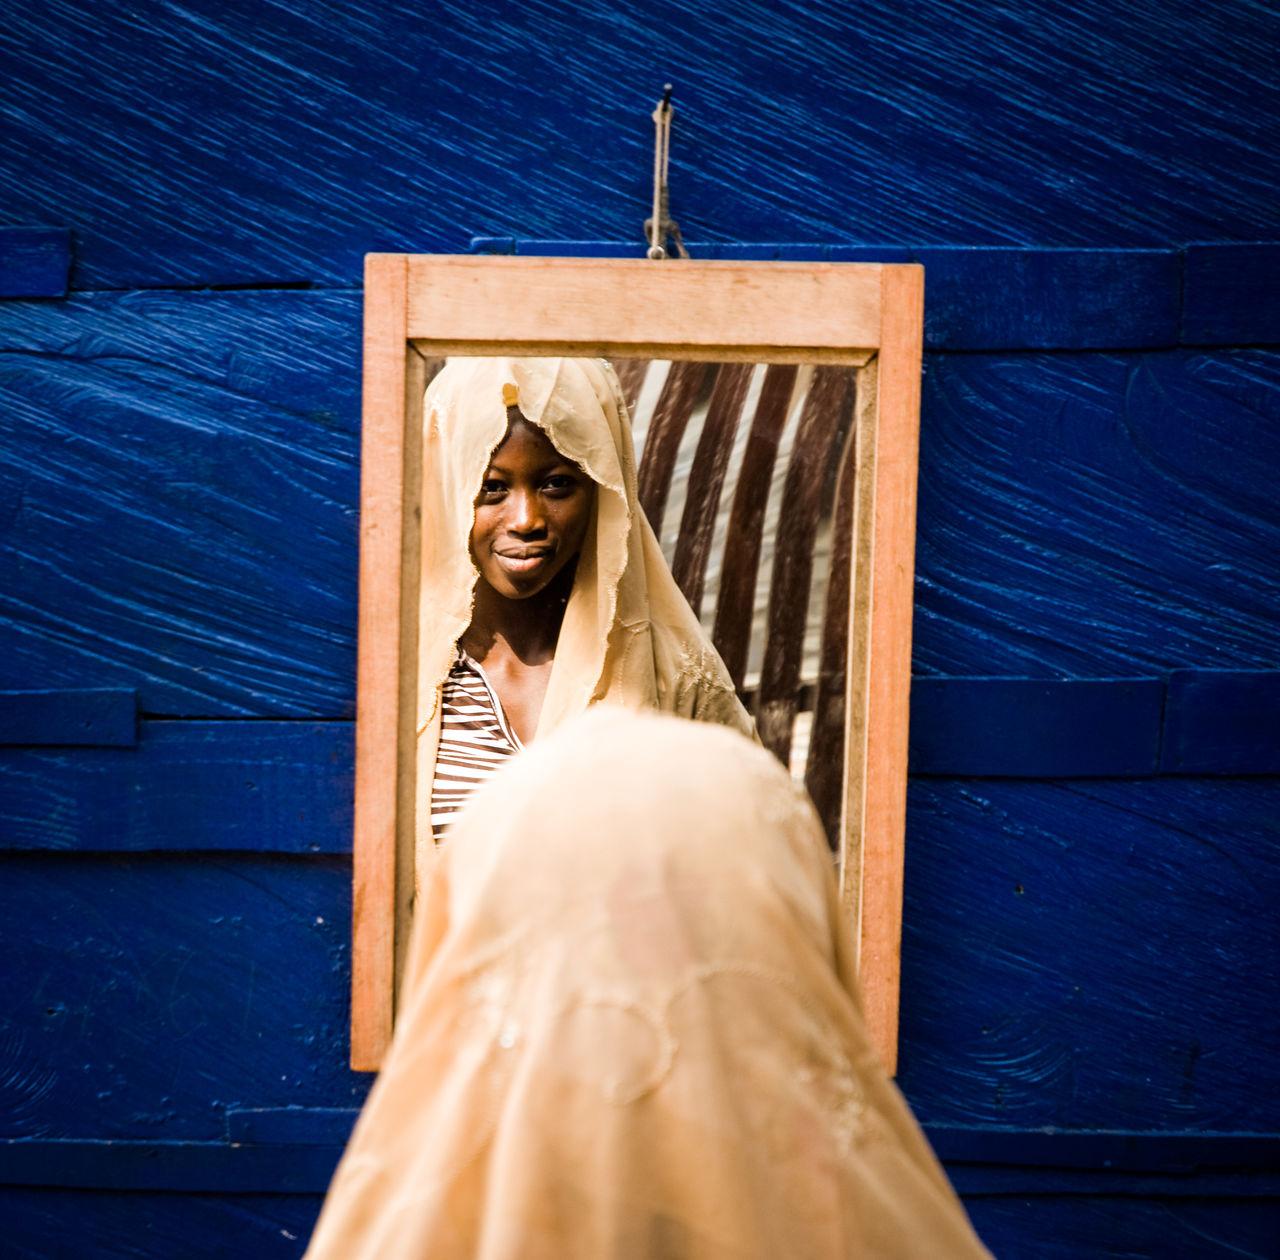 girl in a mirror, Kaneshi market, Accra Market Accra Africa Afrika Blue Ghana Girl Power Headscarf Kopftuch Look Into Mirror Mirror Natural Beauty Portrait Portrait Photography Spiegel Spiegelbild